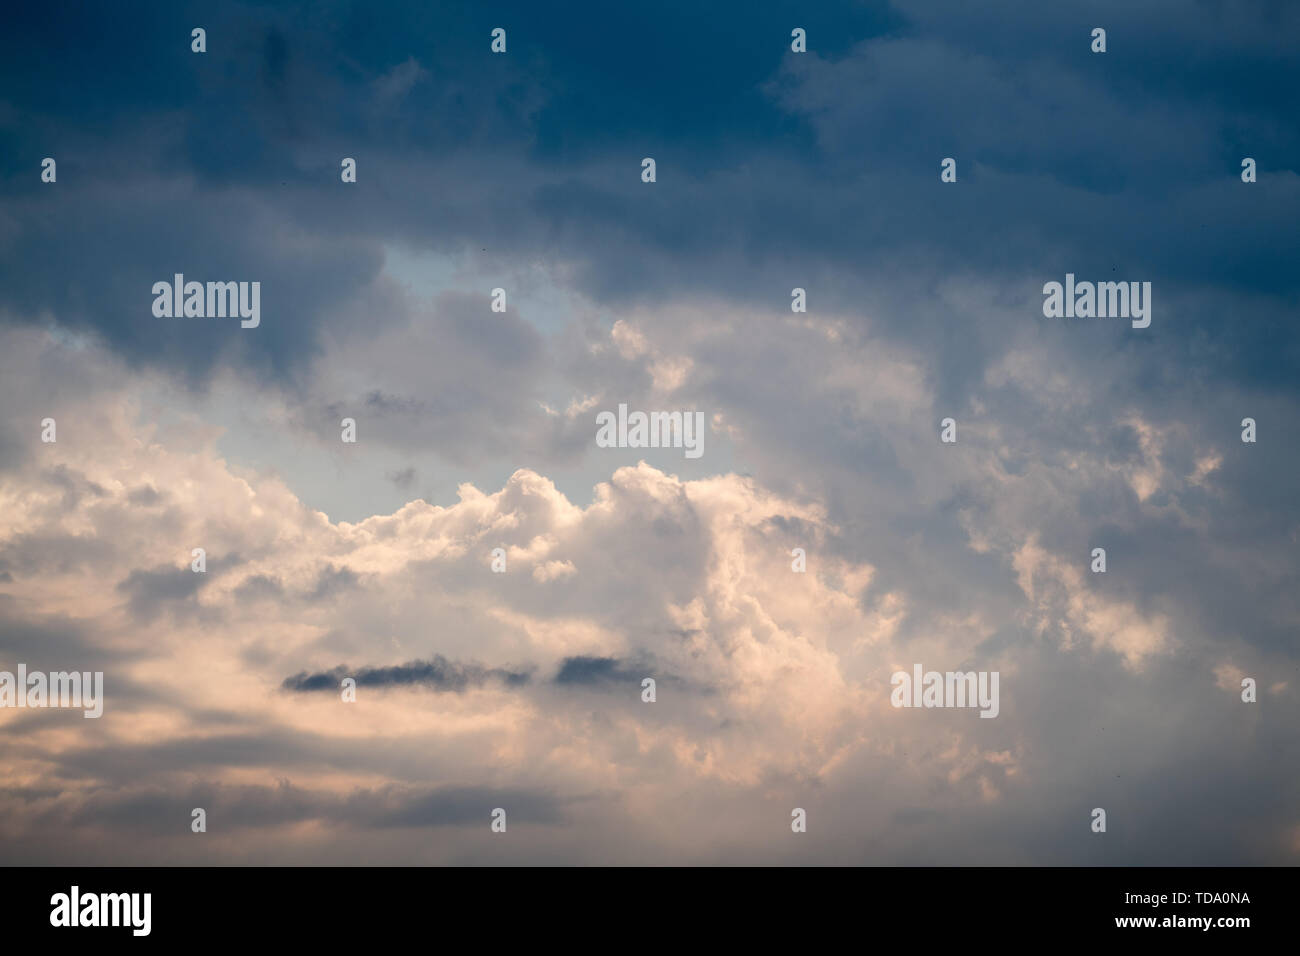 Clouds in Gdansk, Poland. June 1st 2019 © Wojciech Strozyk / Alamy Stock Photo - Stock Image